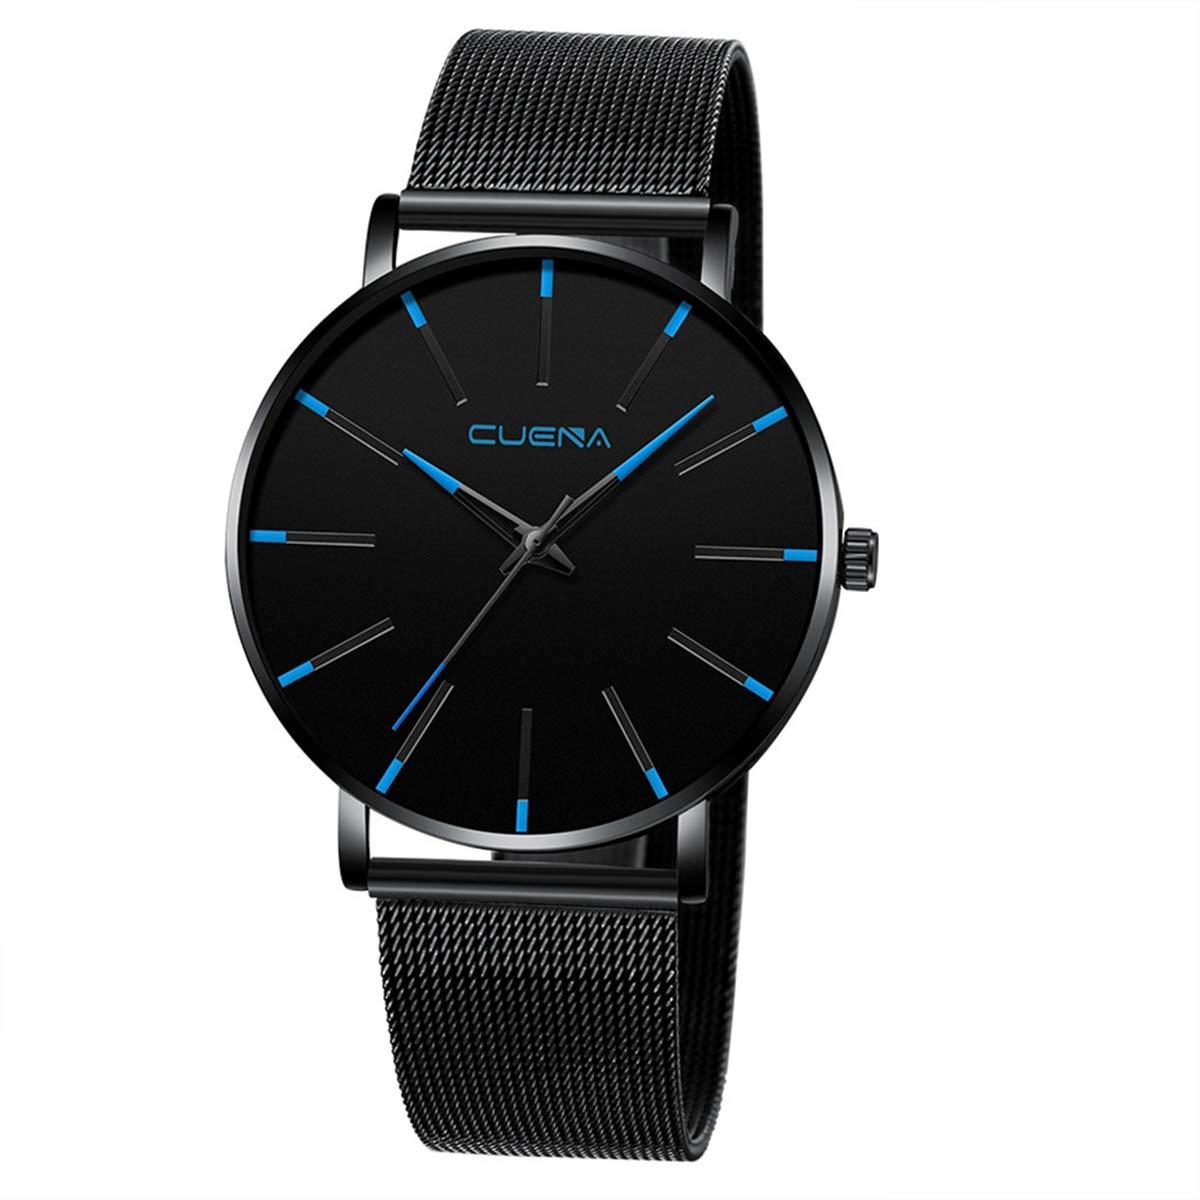 ZODRQ Men's Watch,Fashion Watches Stainless Steel Mesh Wrist Watch Casual Wristwatch Quartz Watch for Men Gift (B) by ZODRQ